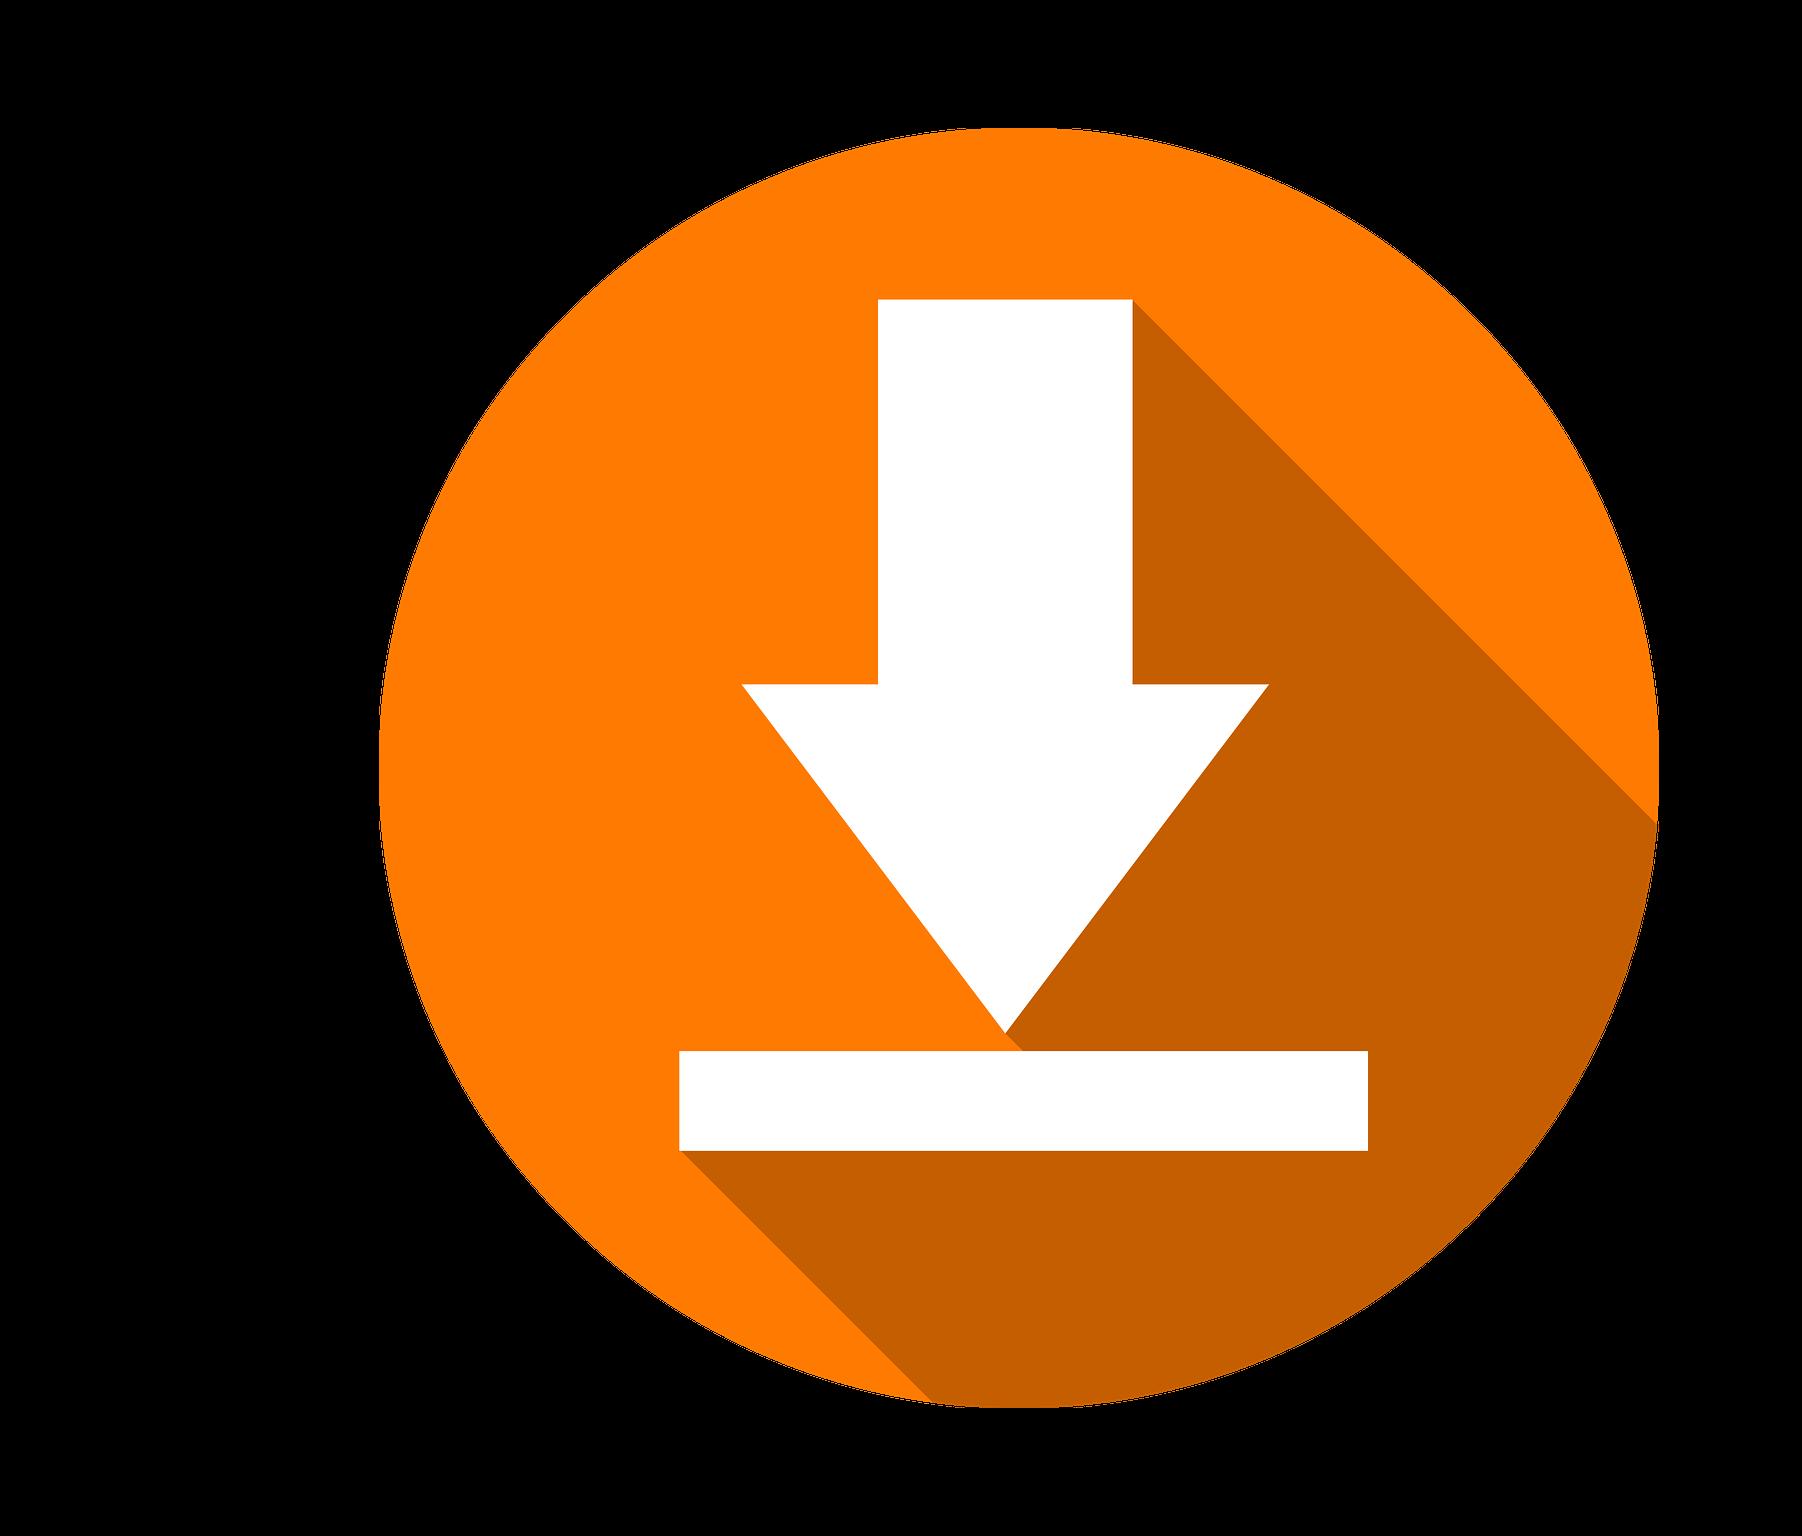 White download icon in orange circle